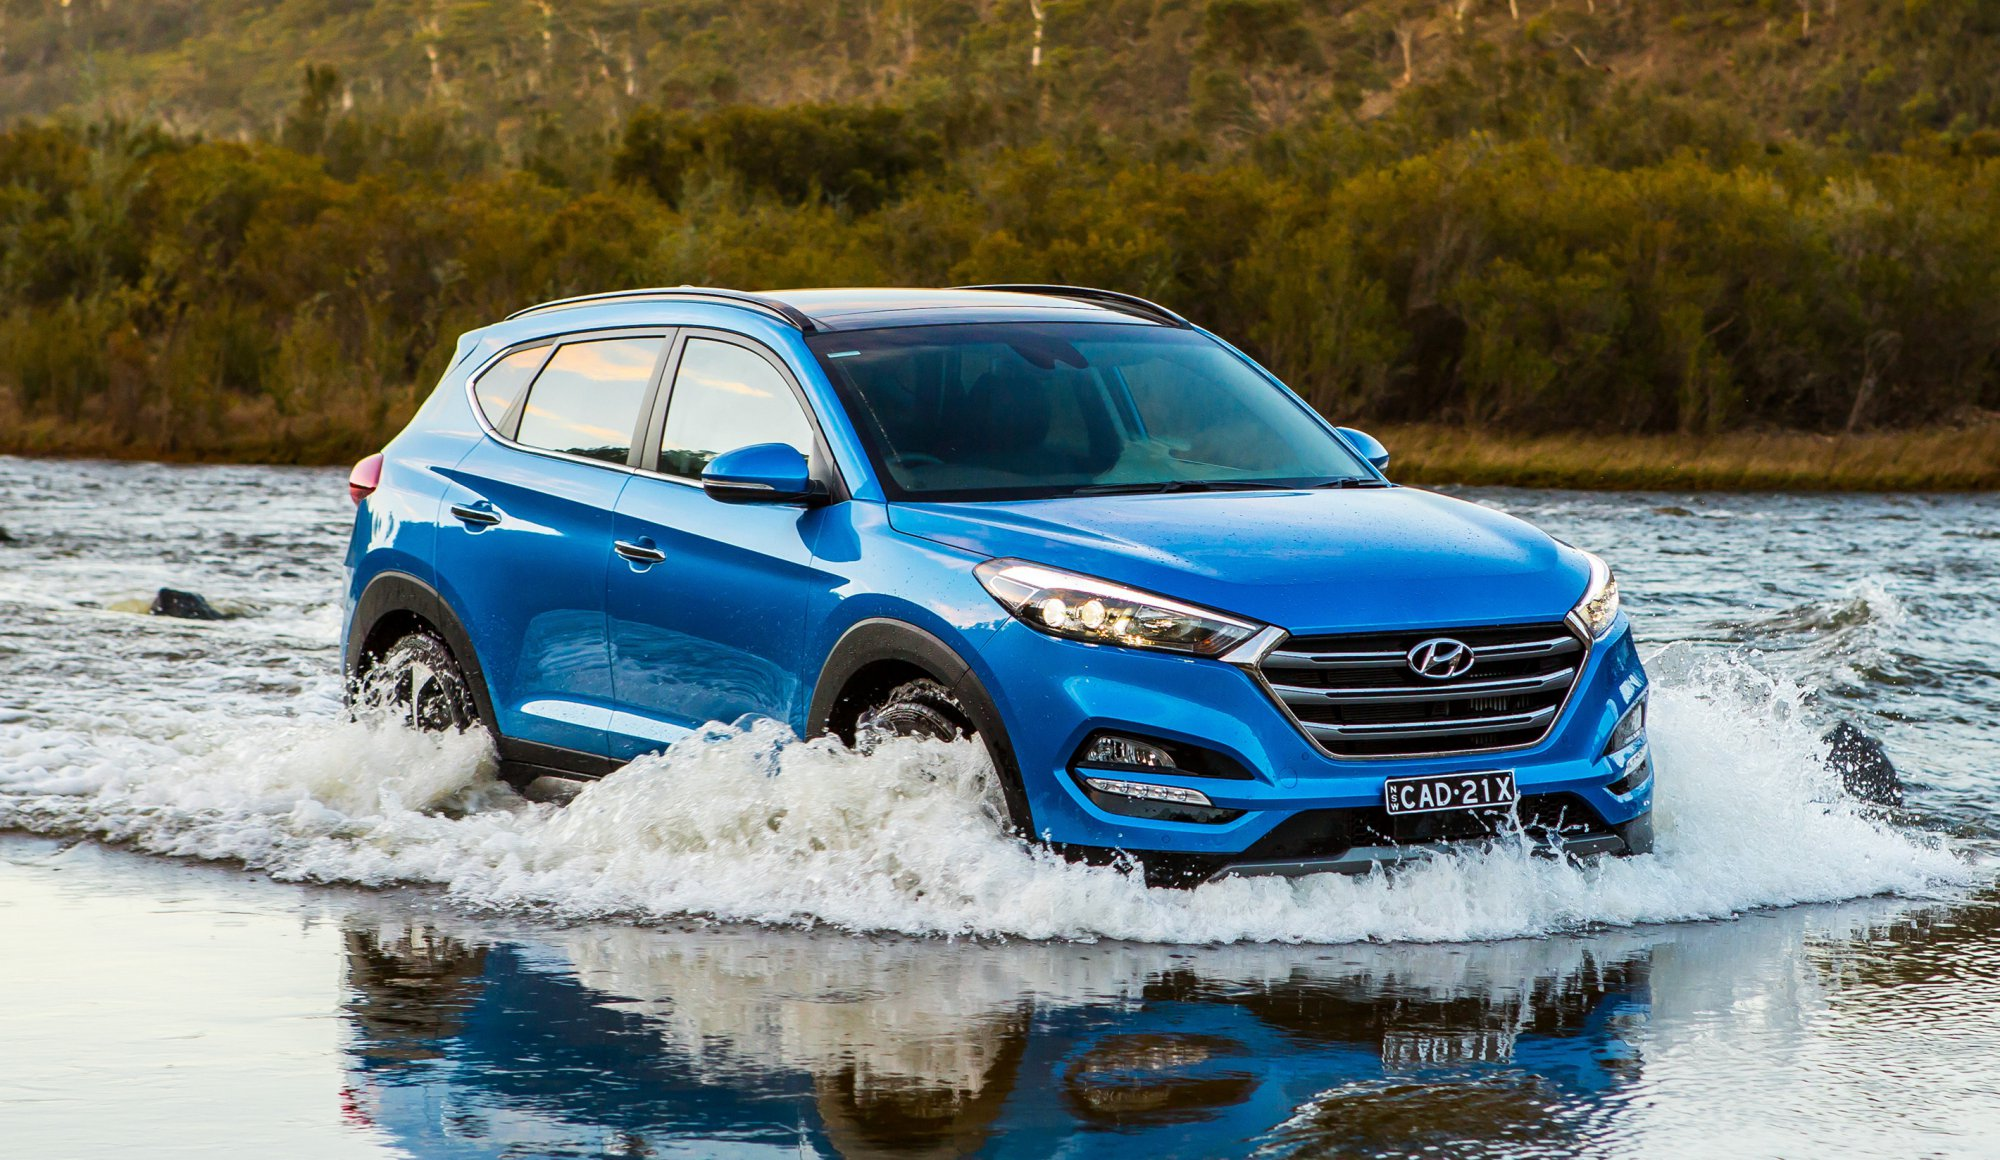 News 2018 Hyundai Tucson Gets Brawnier Smarter